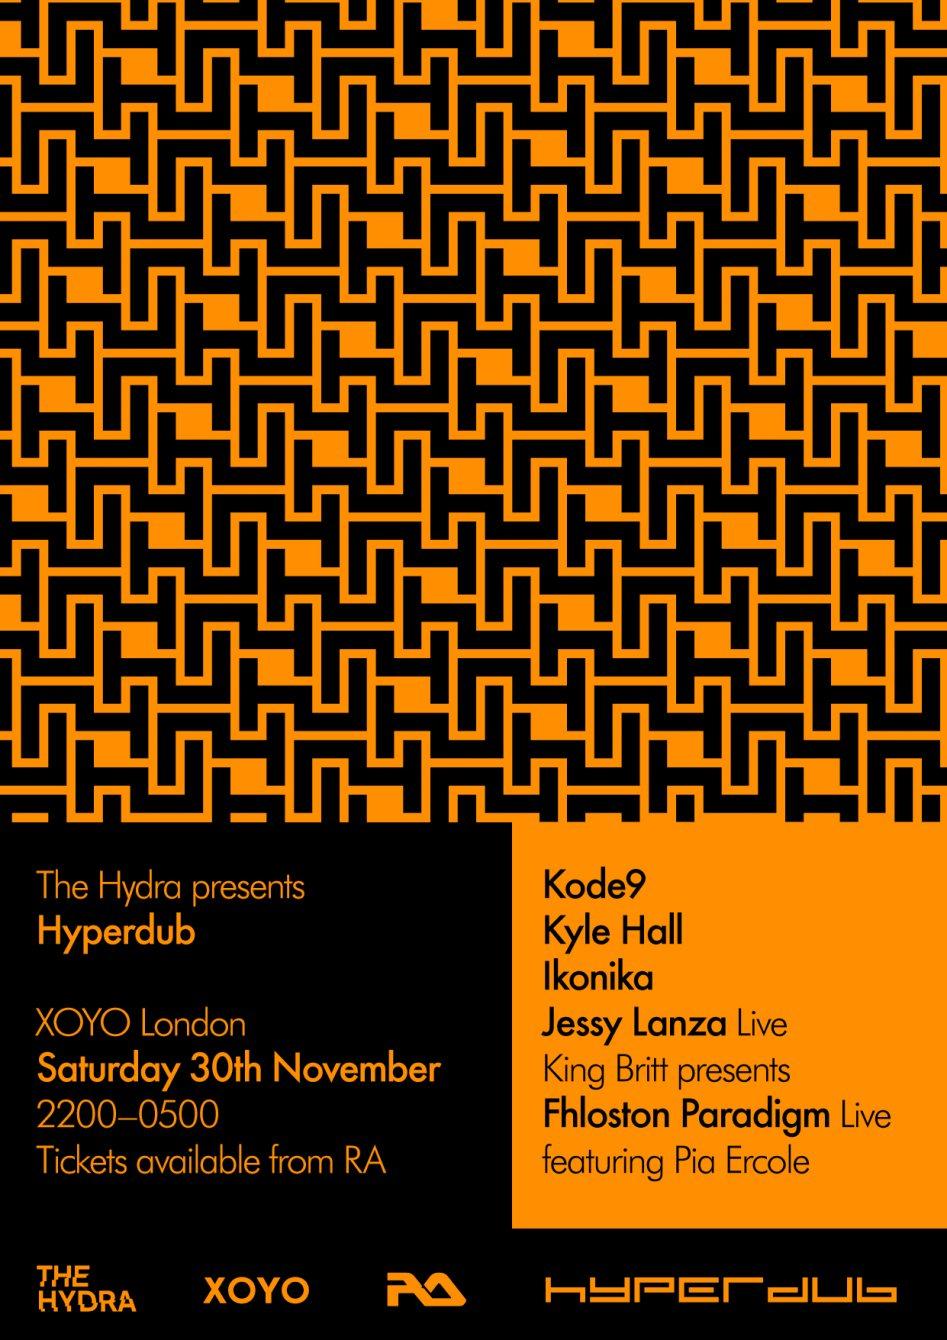 The Hydra: Hyperdub with Kode9, Kyle Hall, Ikonika, Fhloston Paradigm, Jessy Lanza - Flyer front